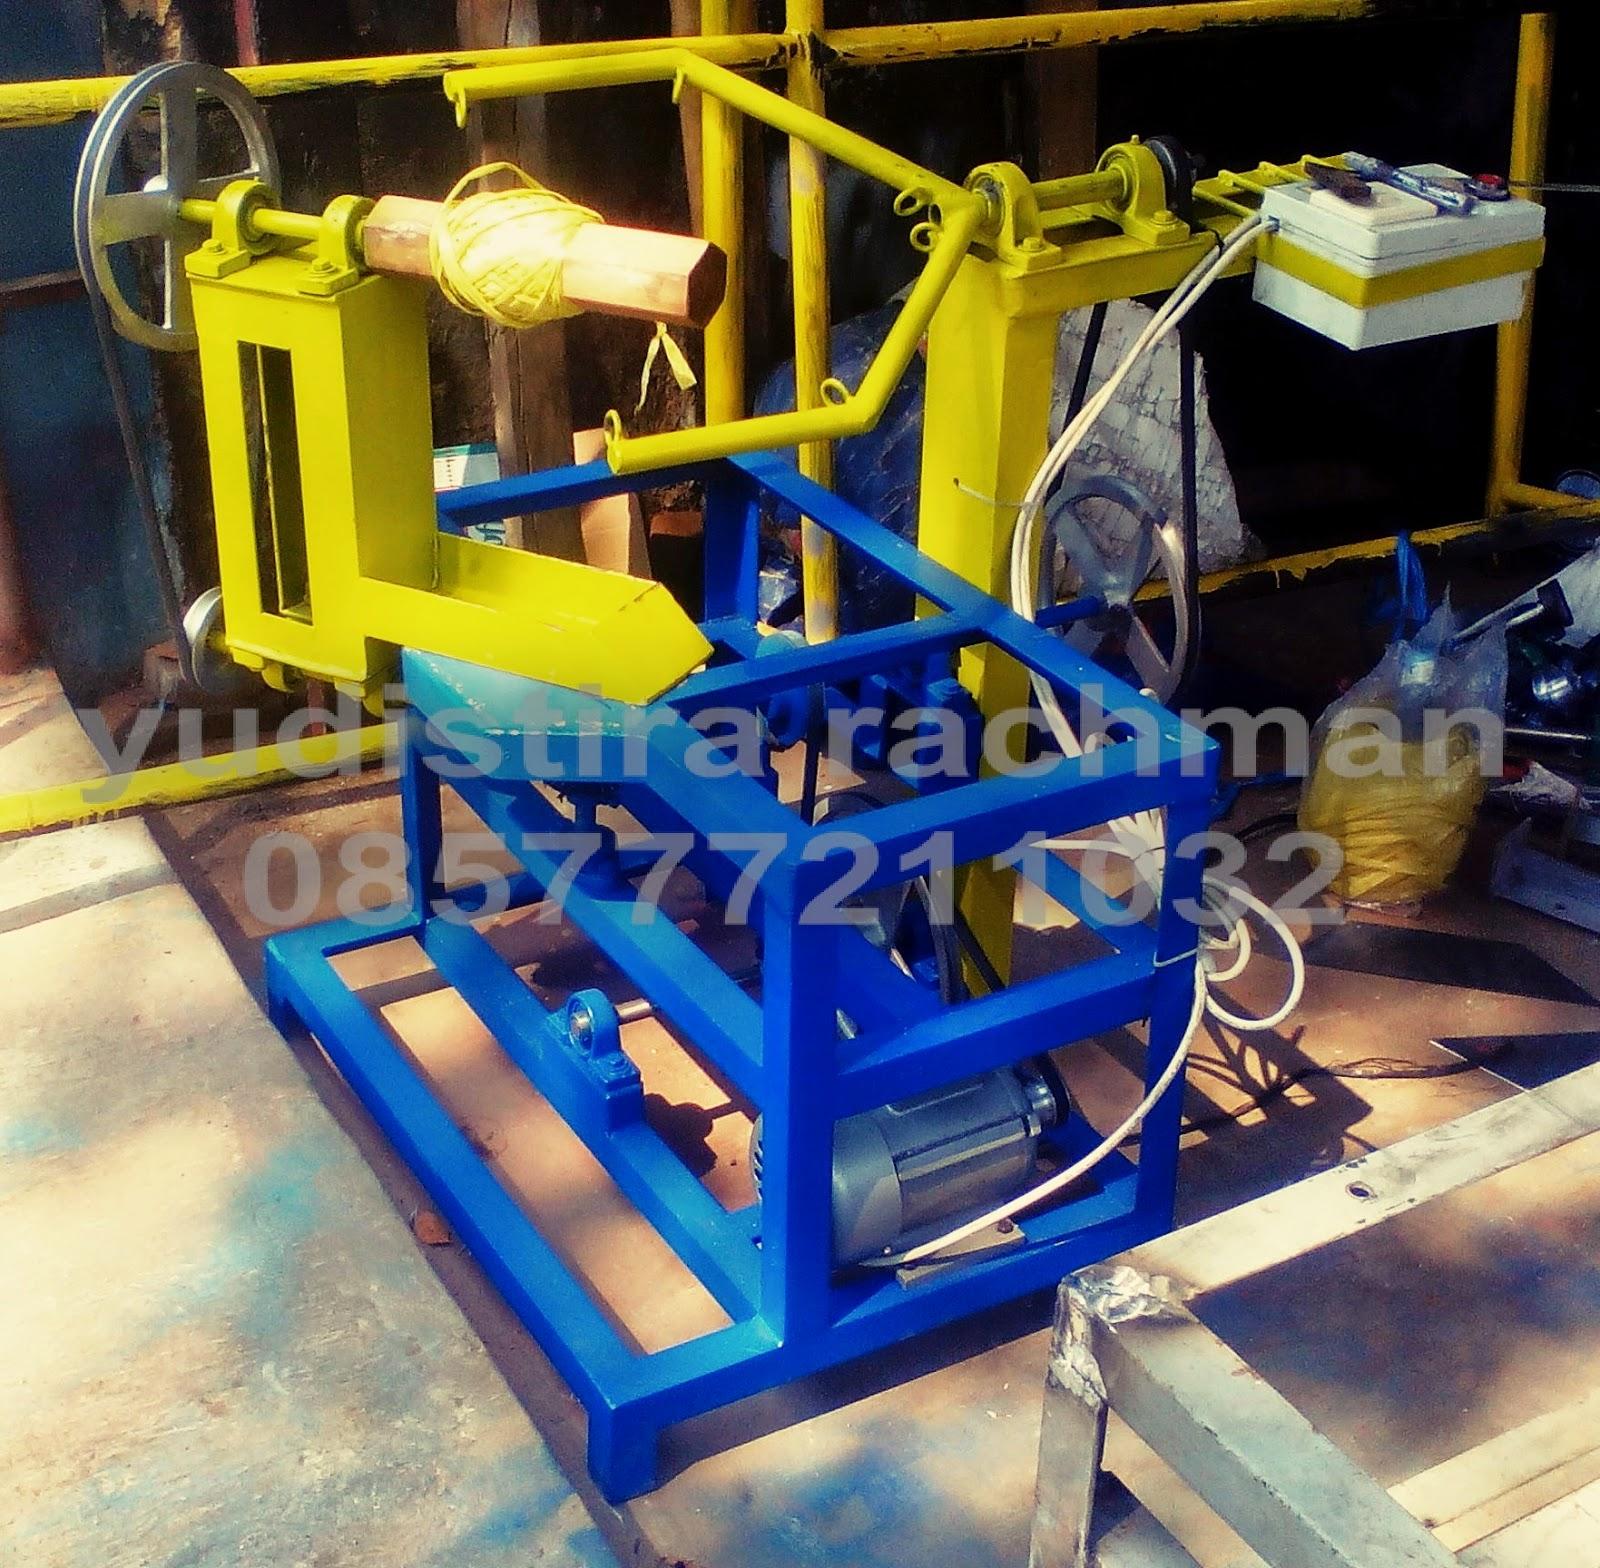 mesin gulung rafia Padang